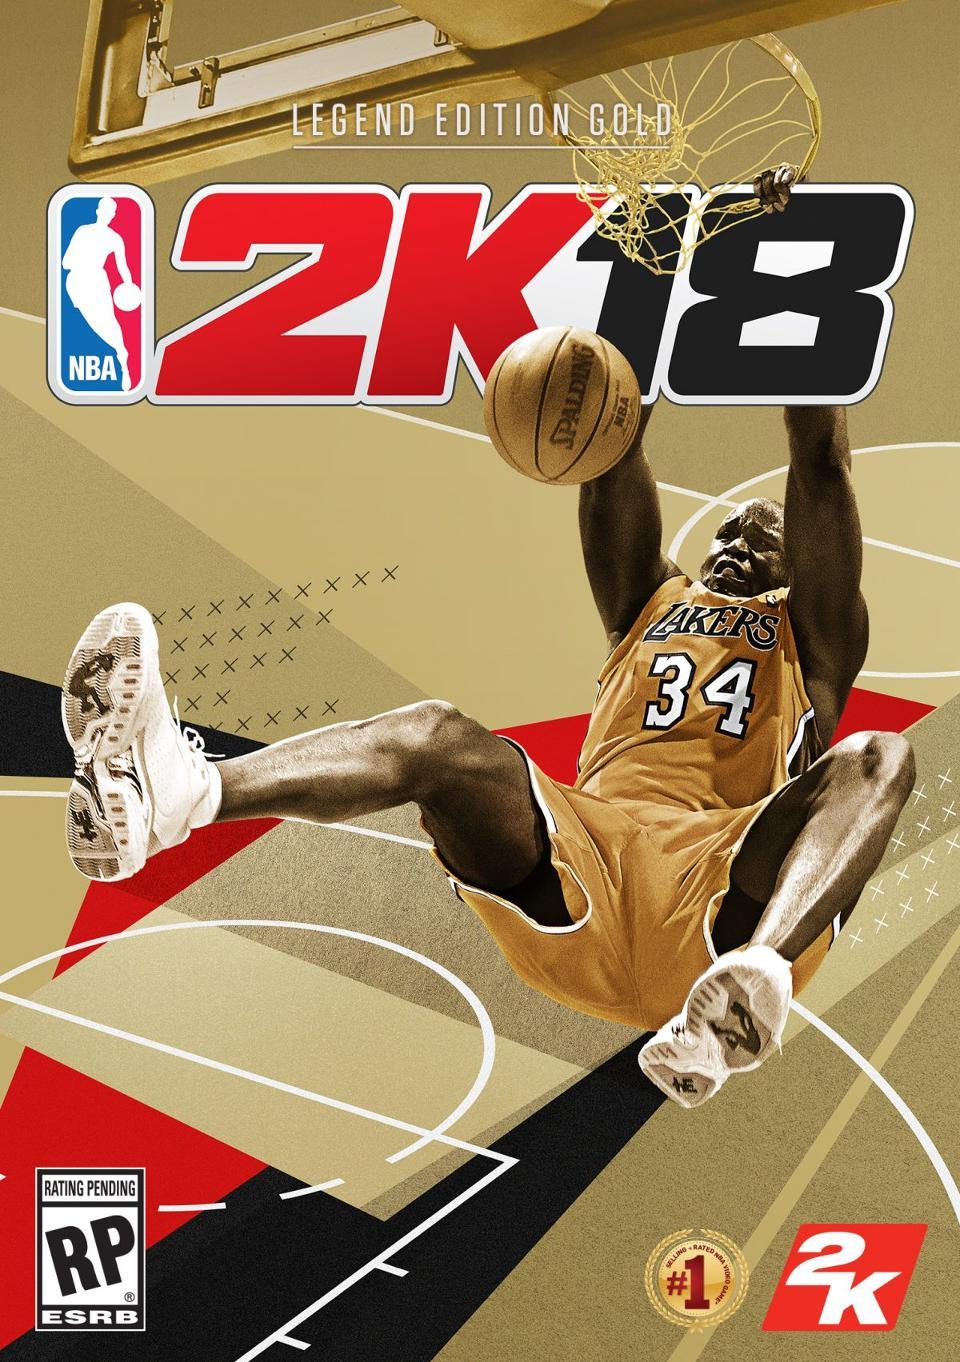 NBA 2K18 Brings Back a Familiar Face for